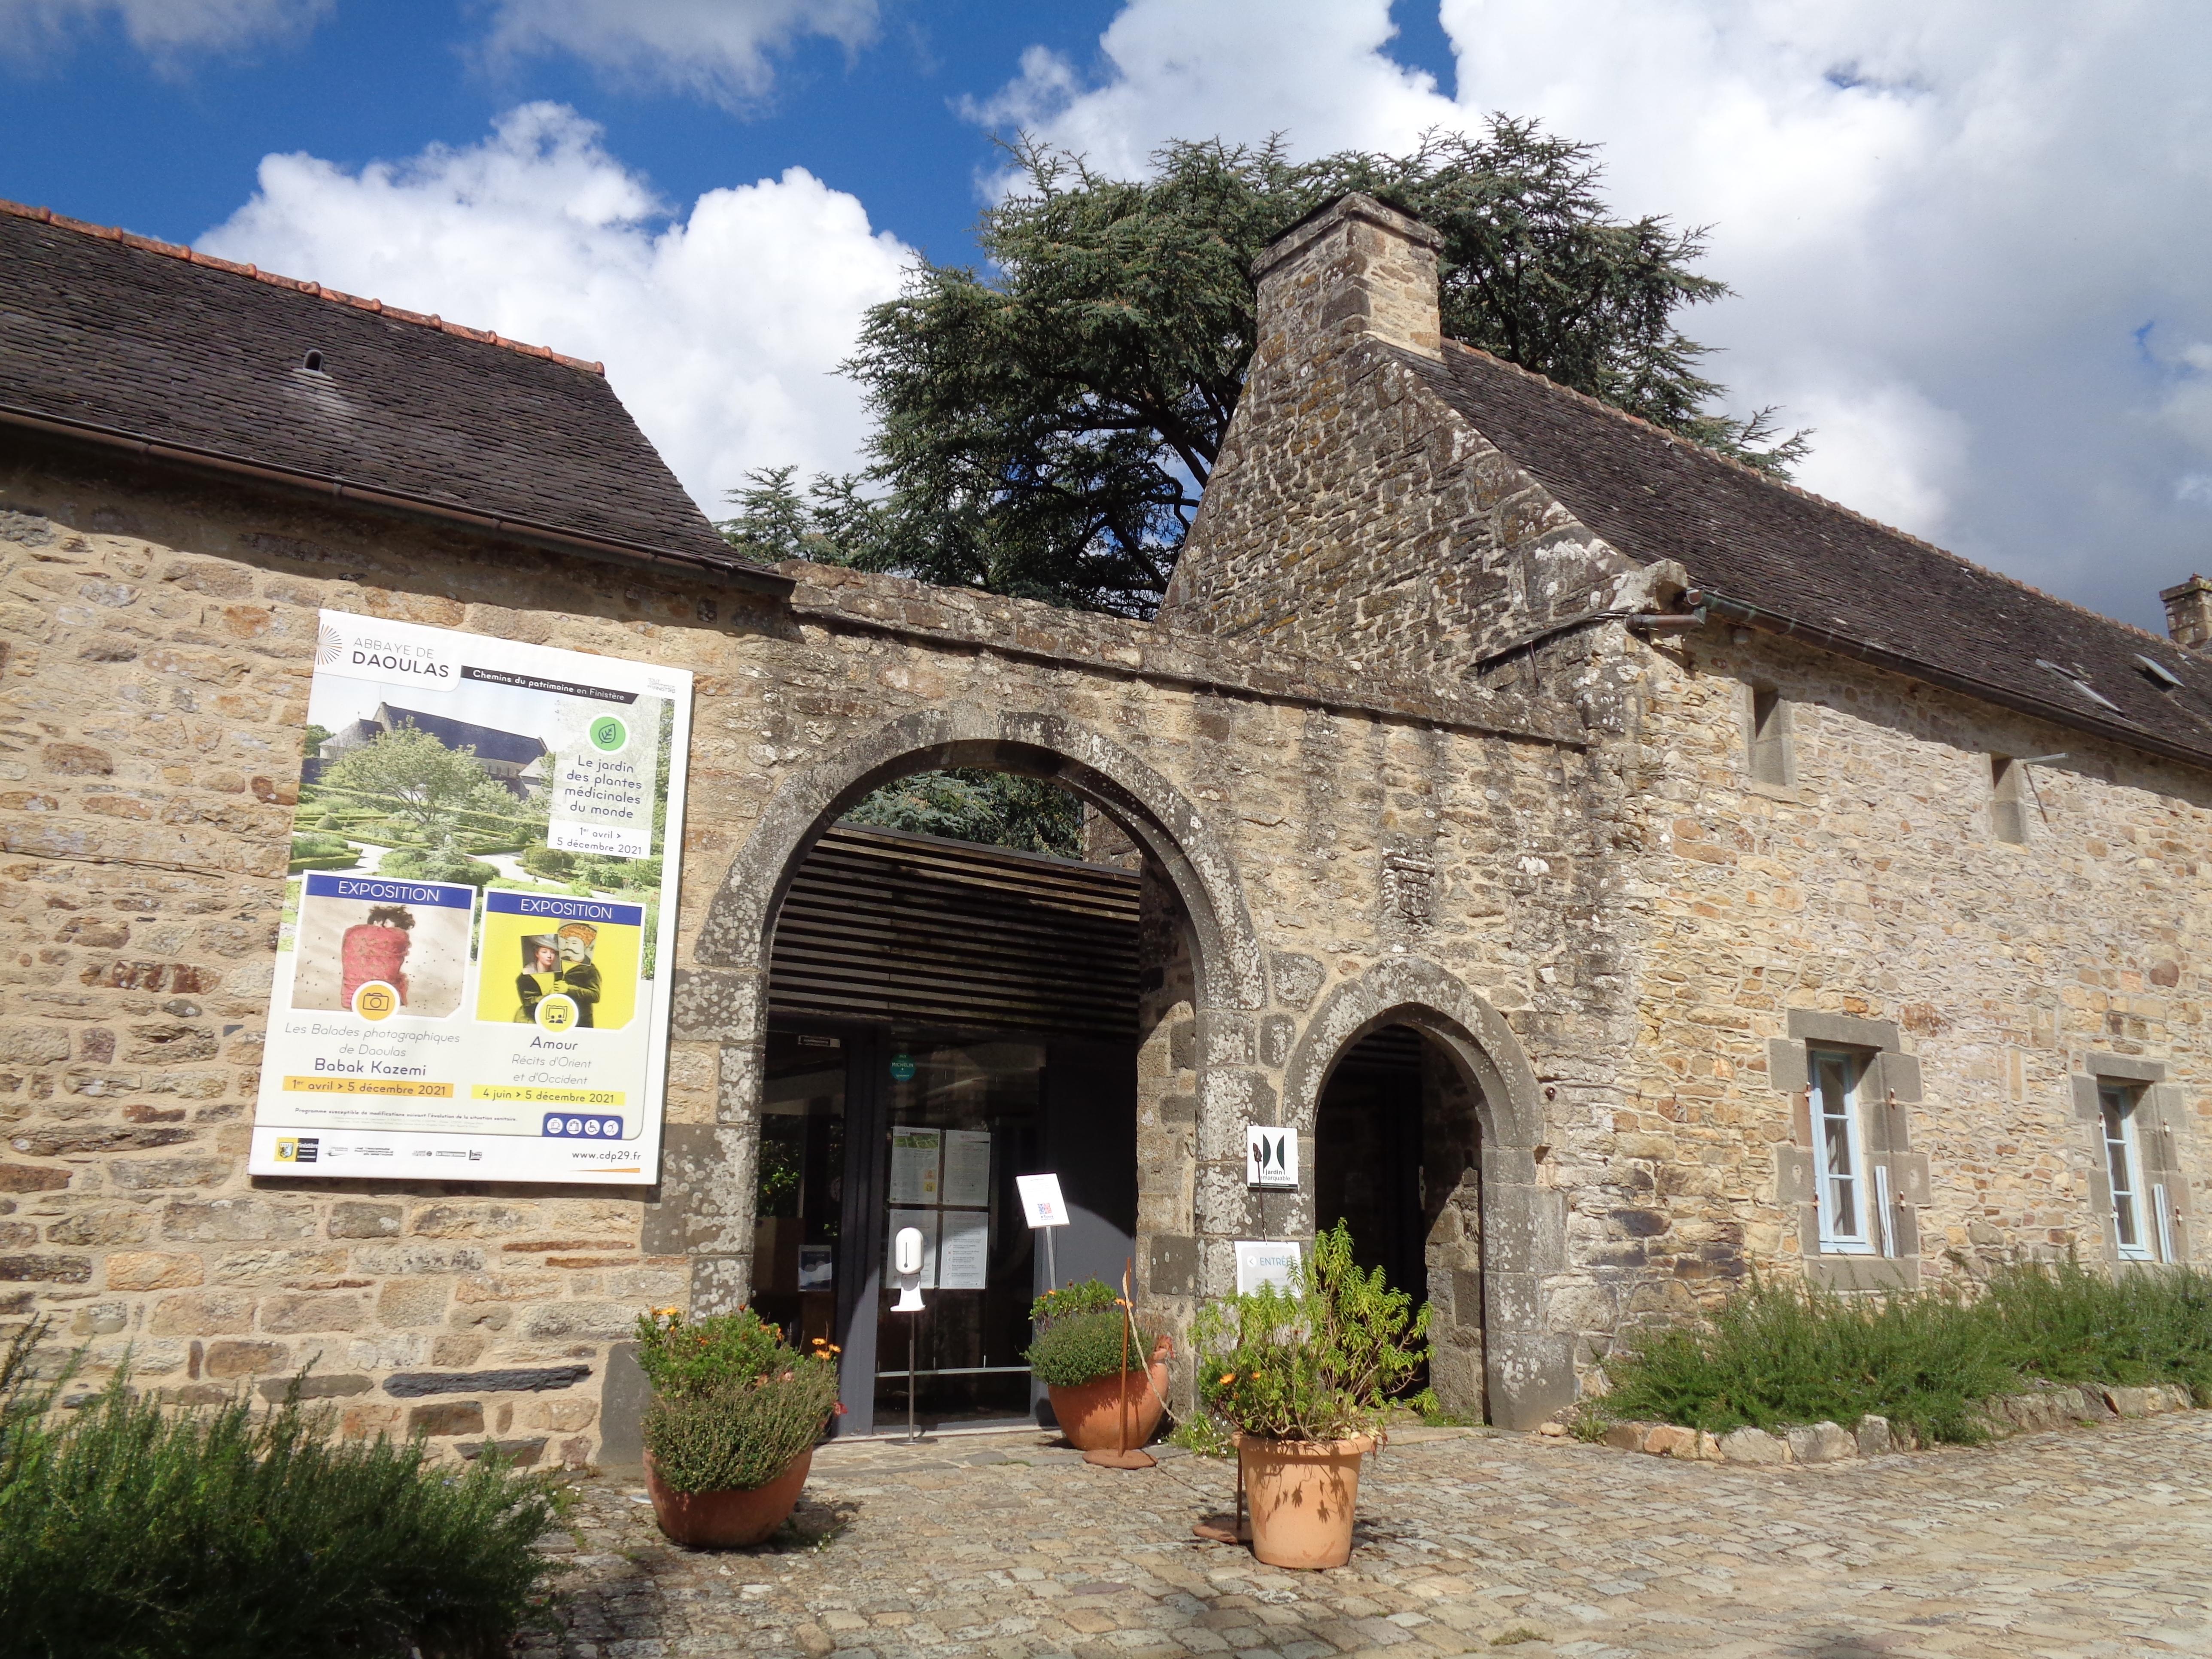 Daoulas abbaye ch ND gardens ent sep21